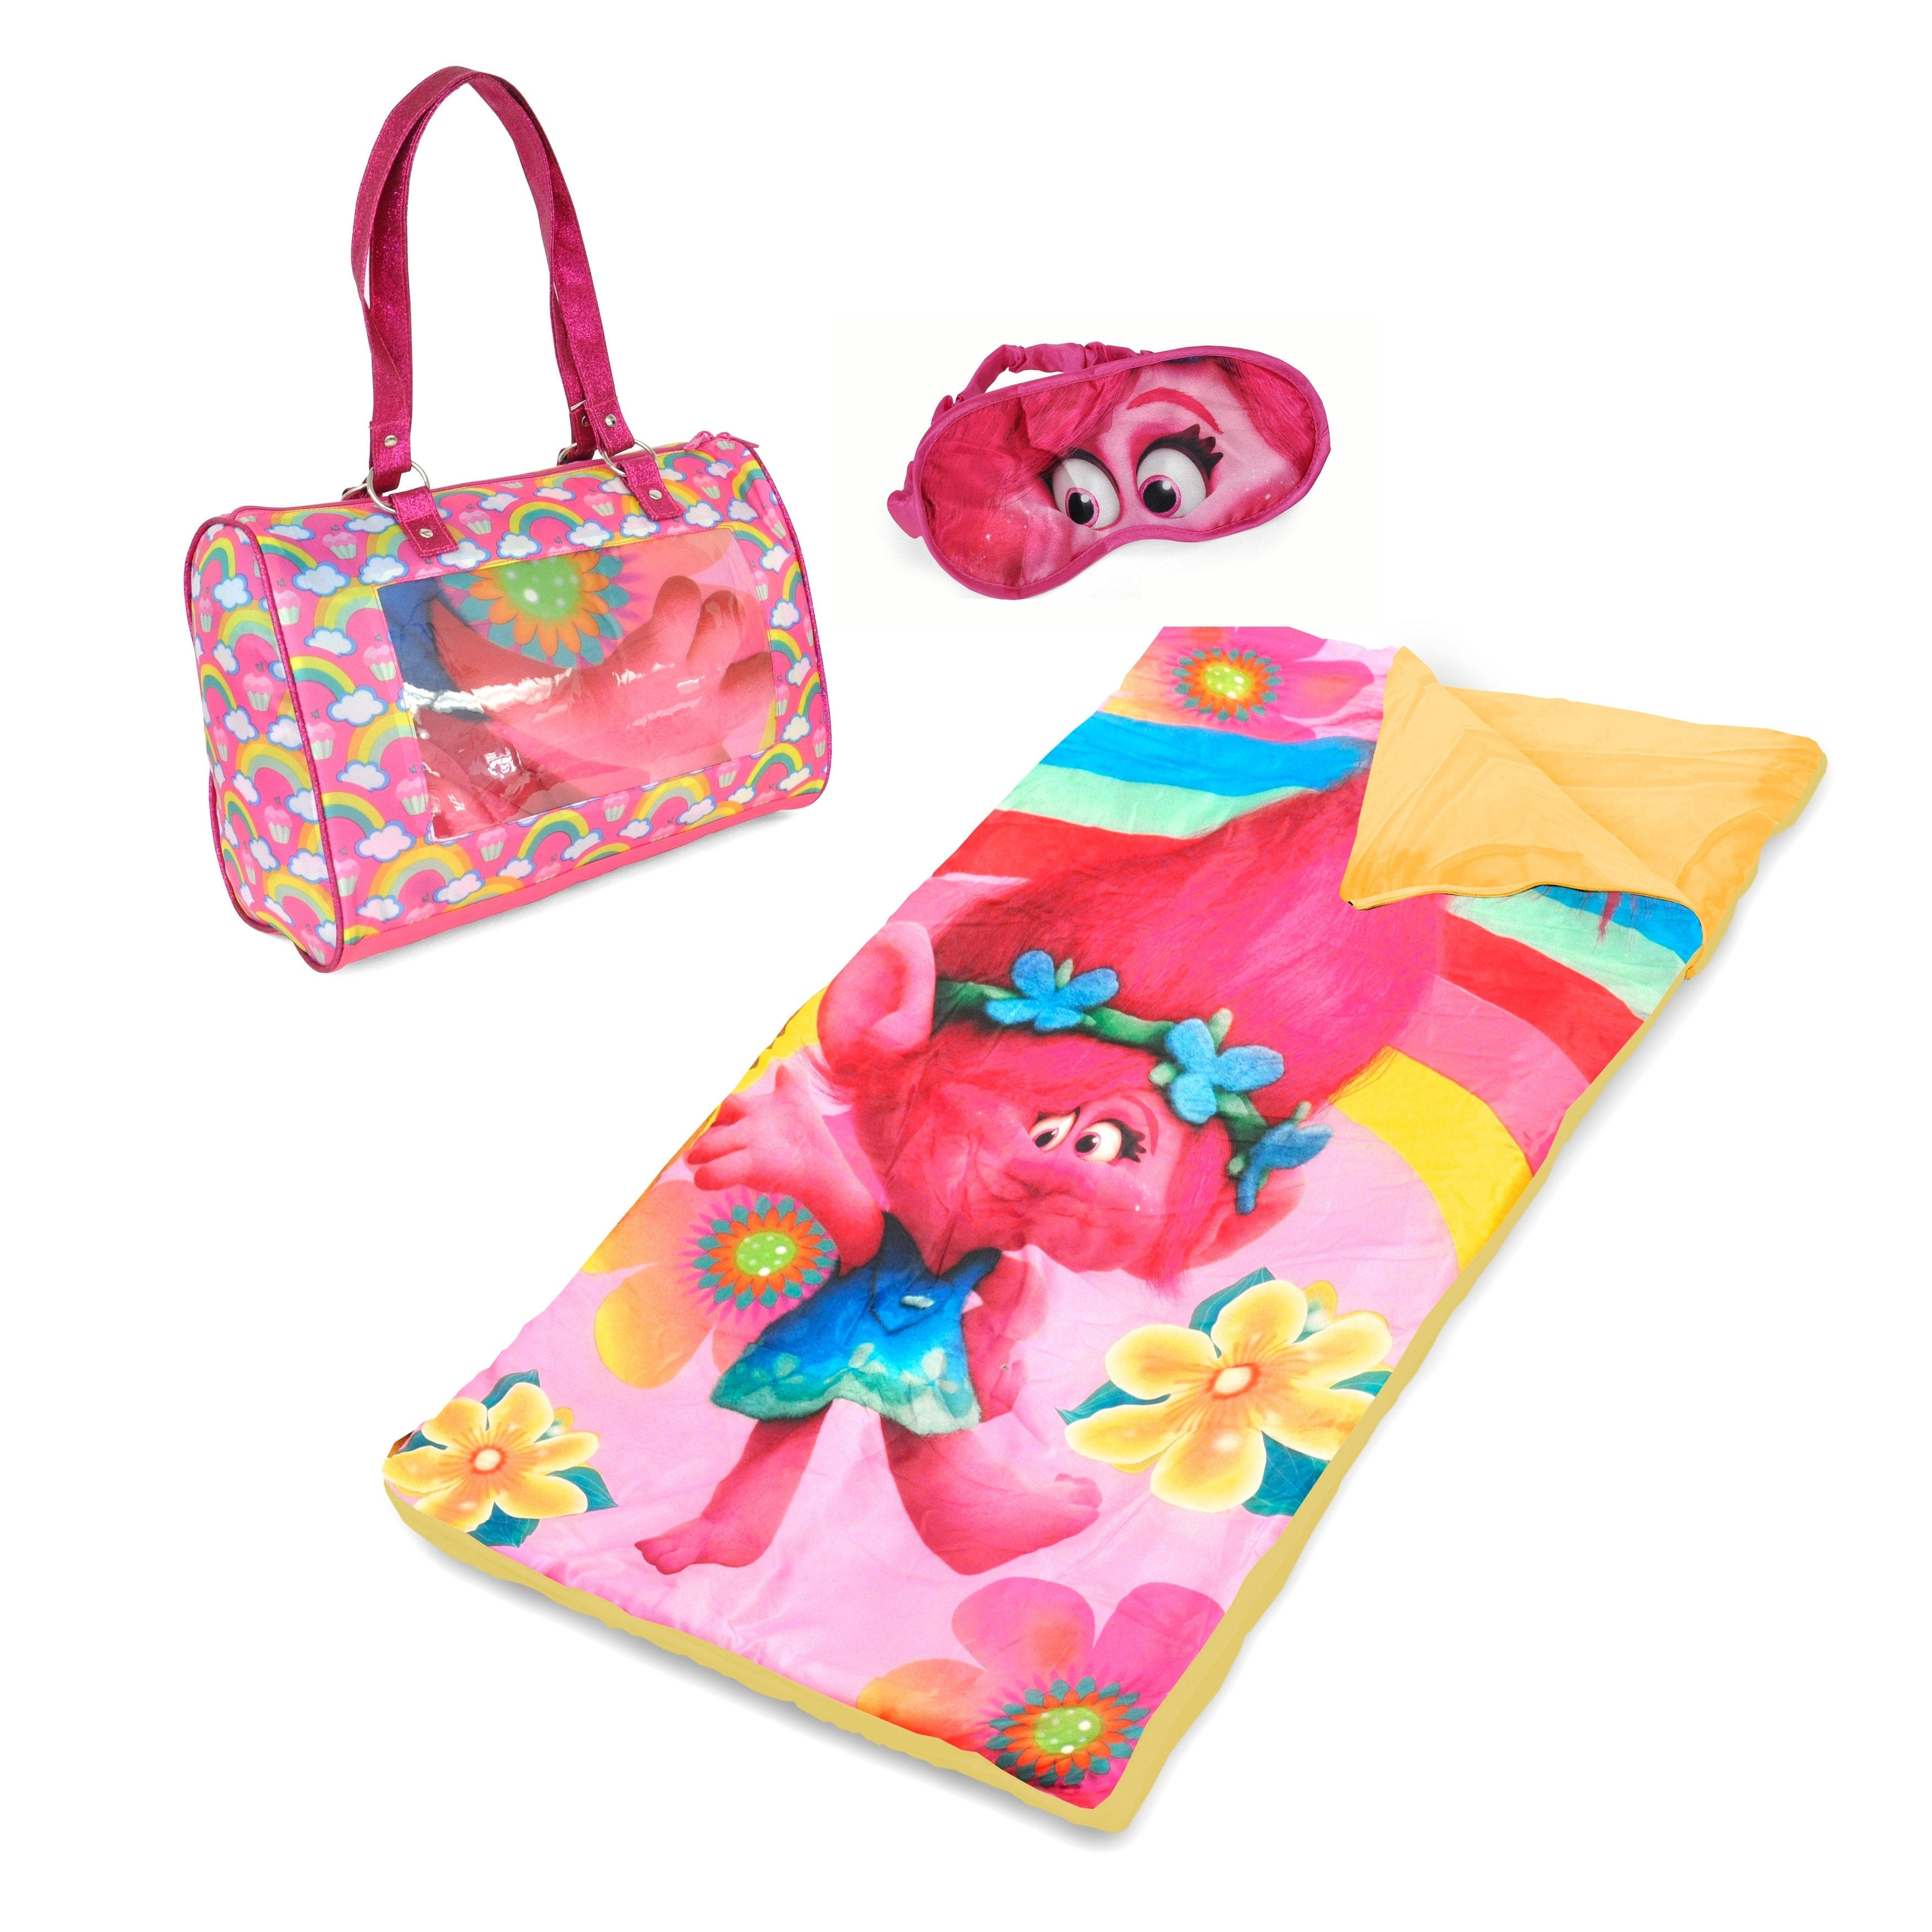 Dreamworks Trolls Sleeping Bag Set with Purse and Eyemask...